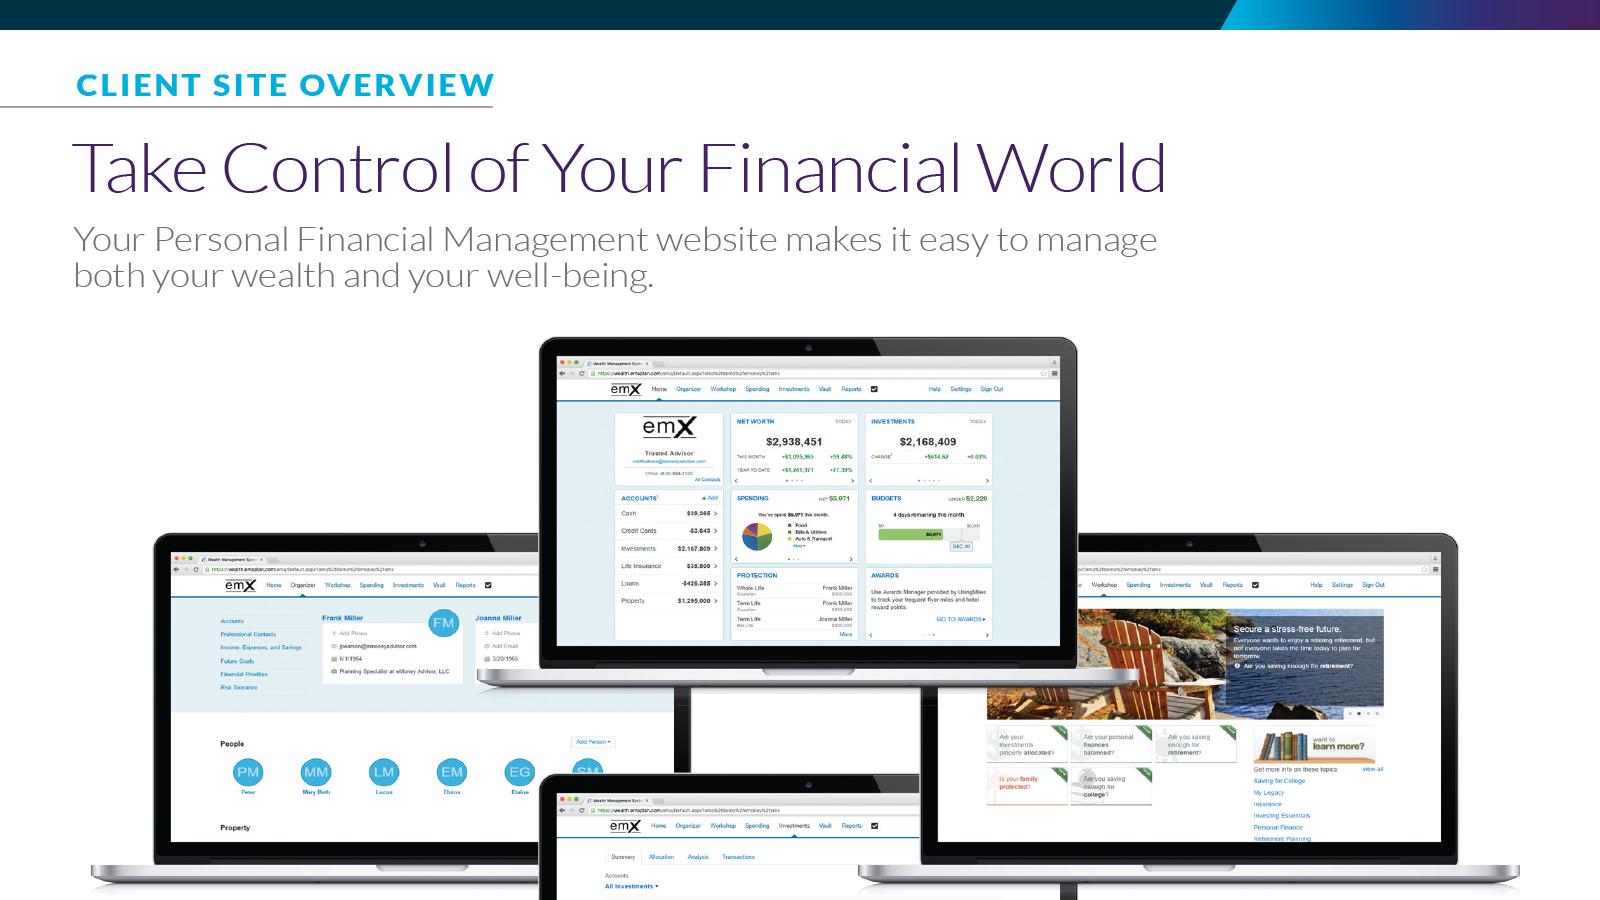 Client Site Overview [PDF Download]